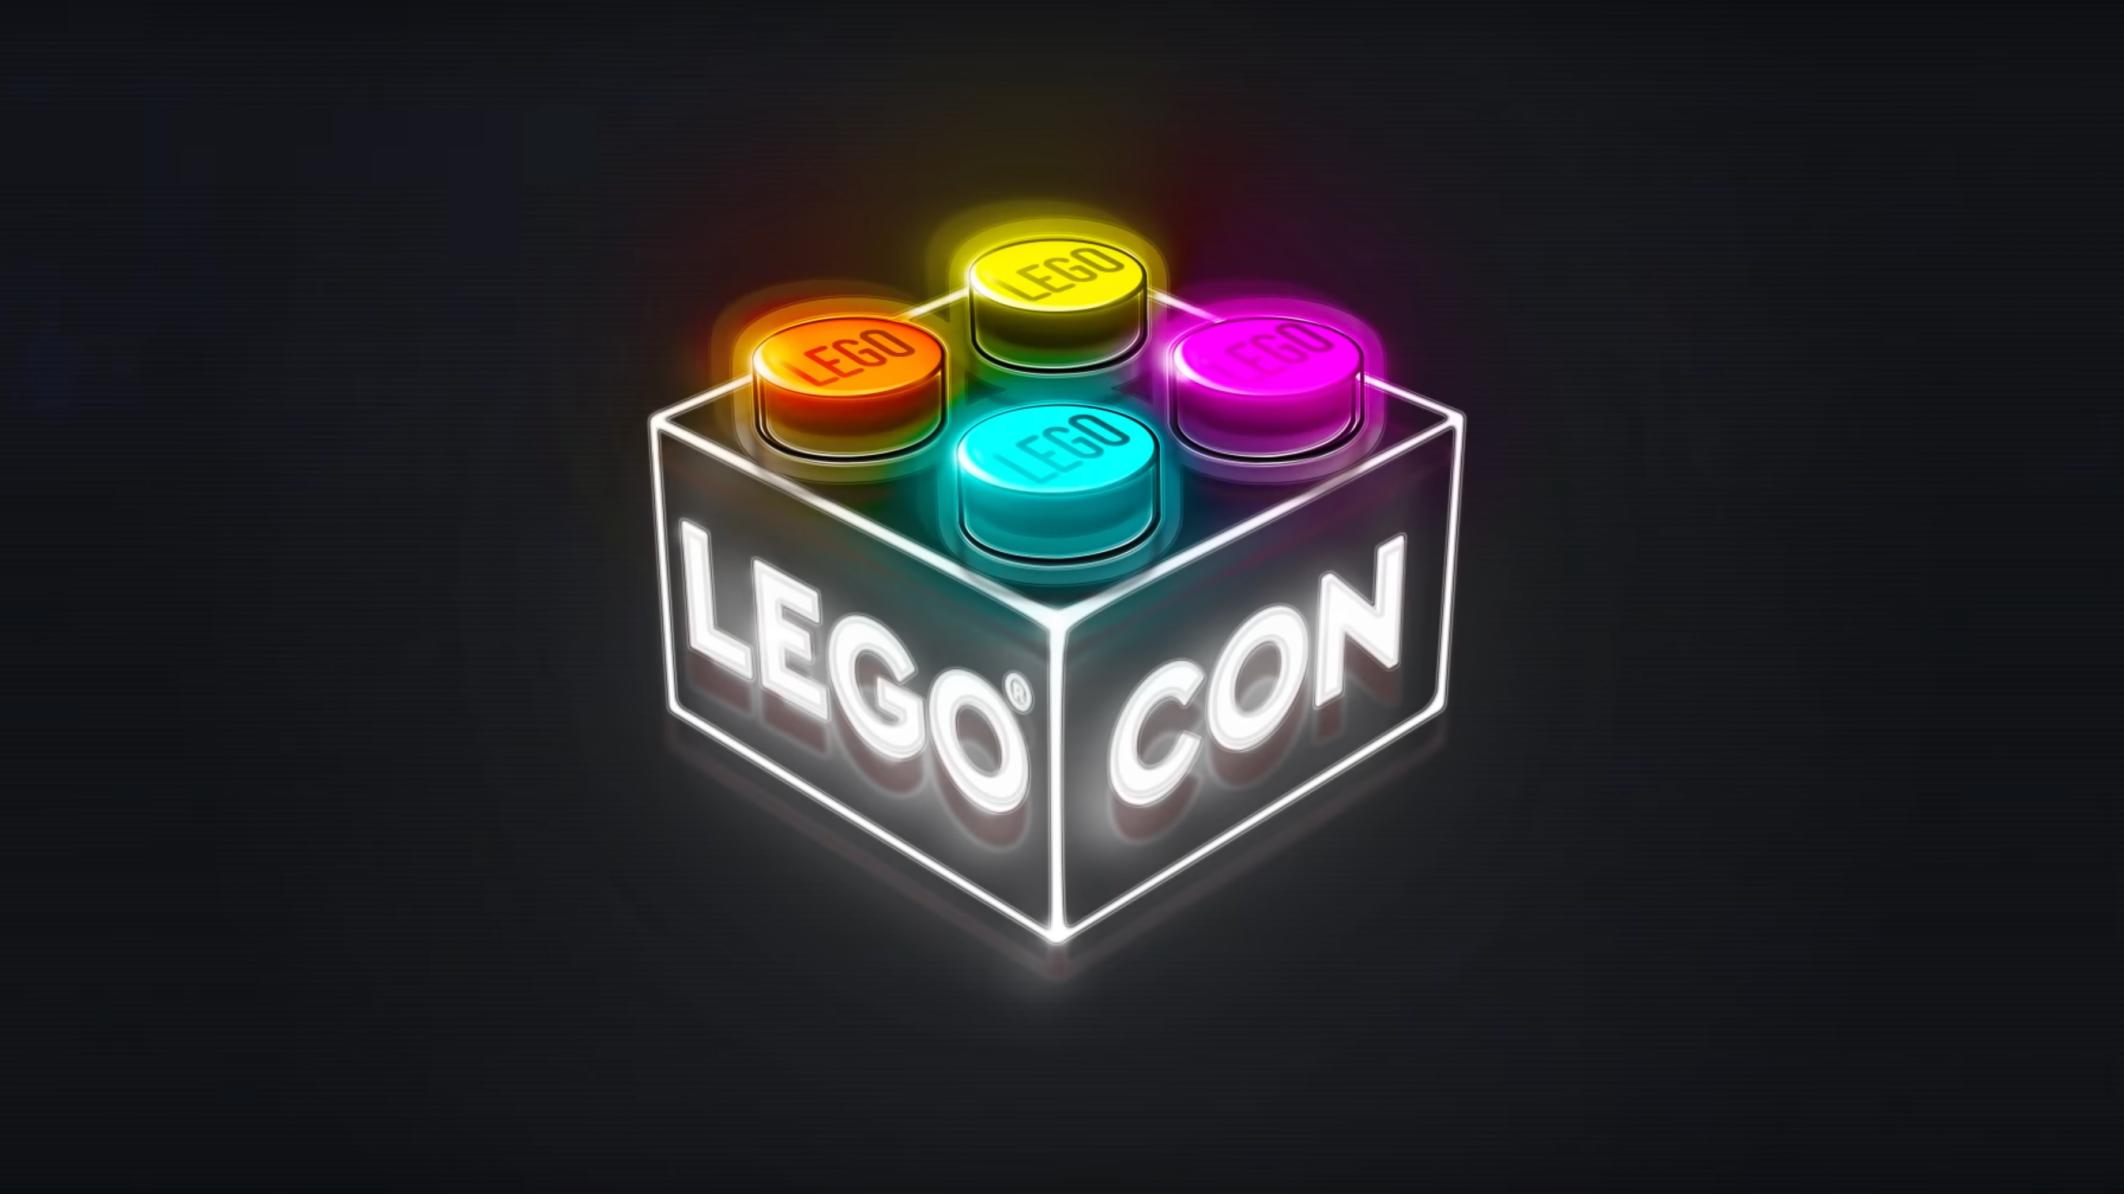 Lego проведет онлайн-фестиваль Lego Con